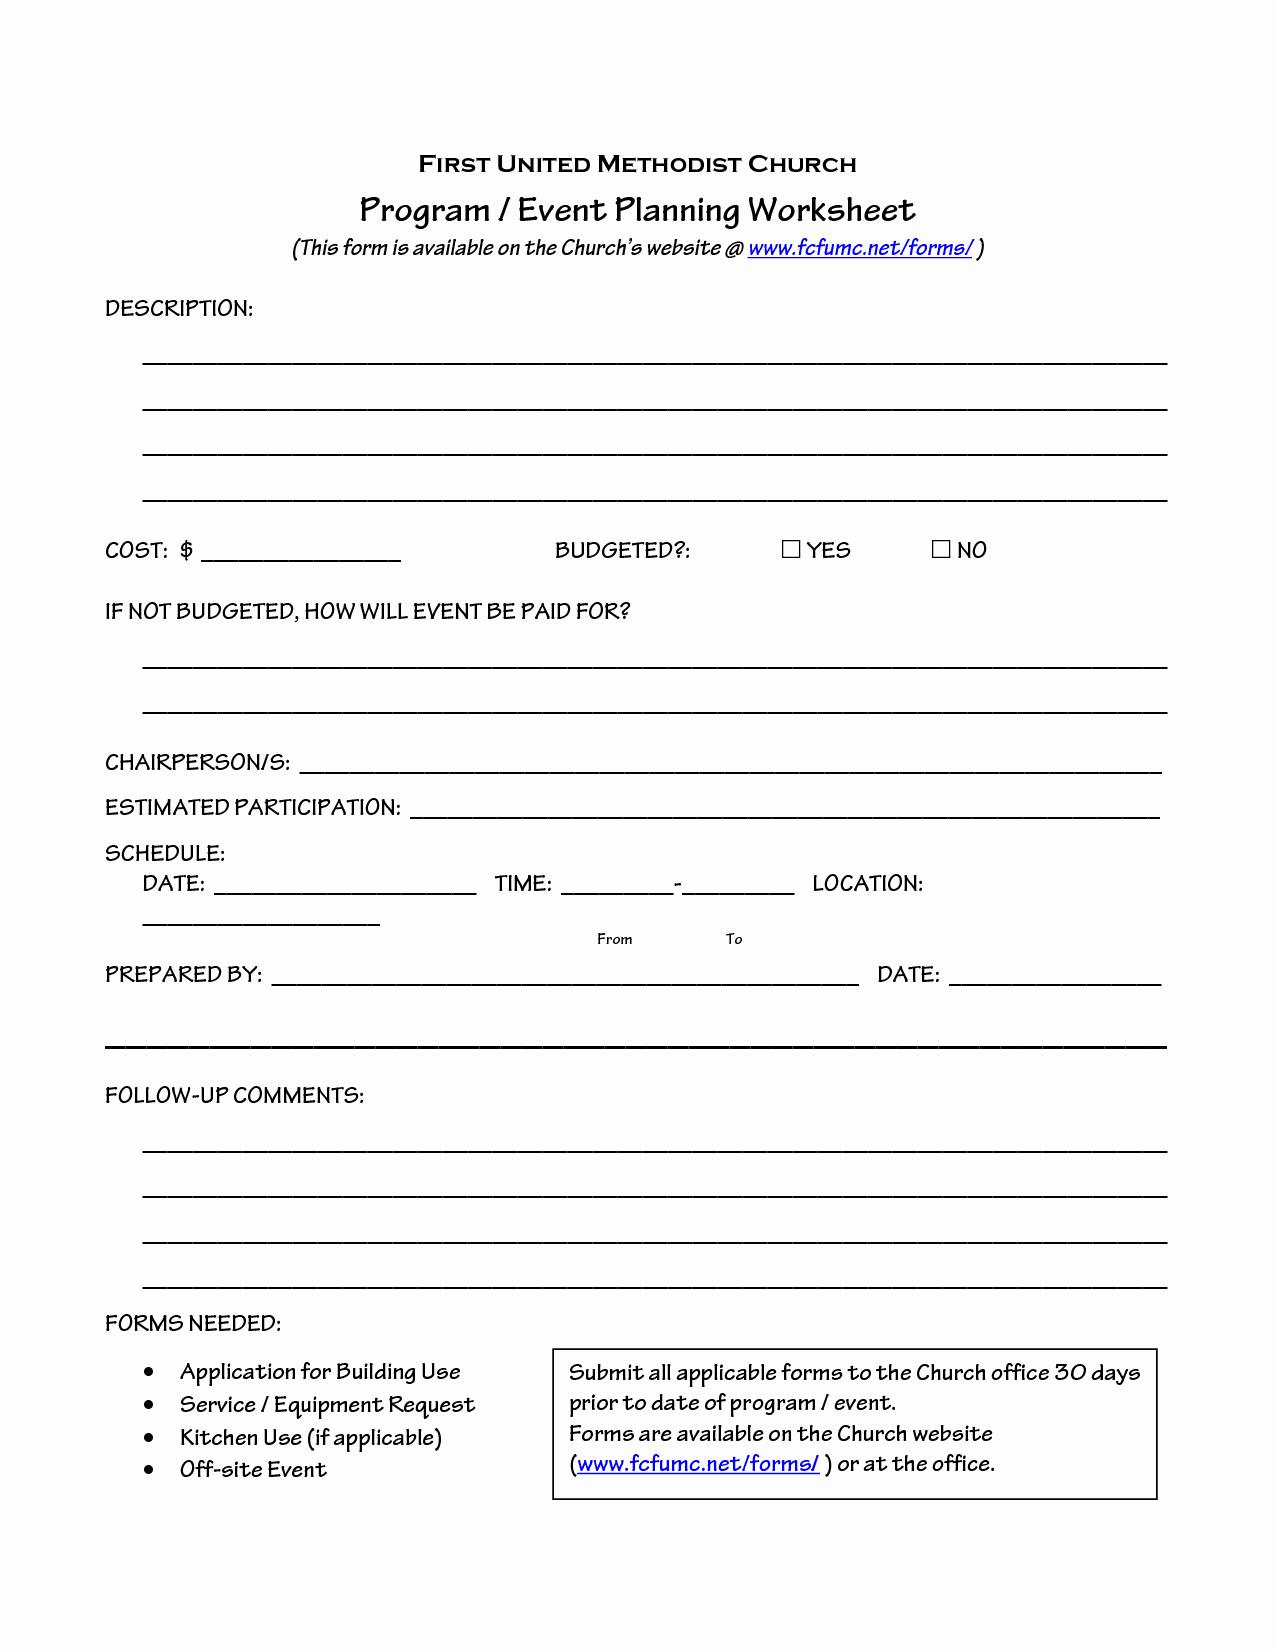 Event Planning Worksheet Template Unique Church event Planning Worksheet organize It